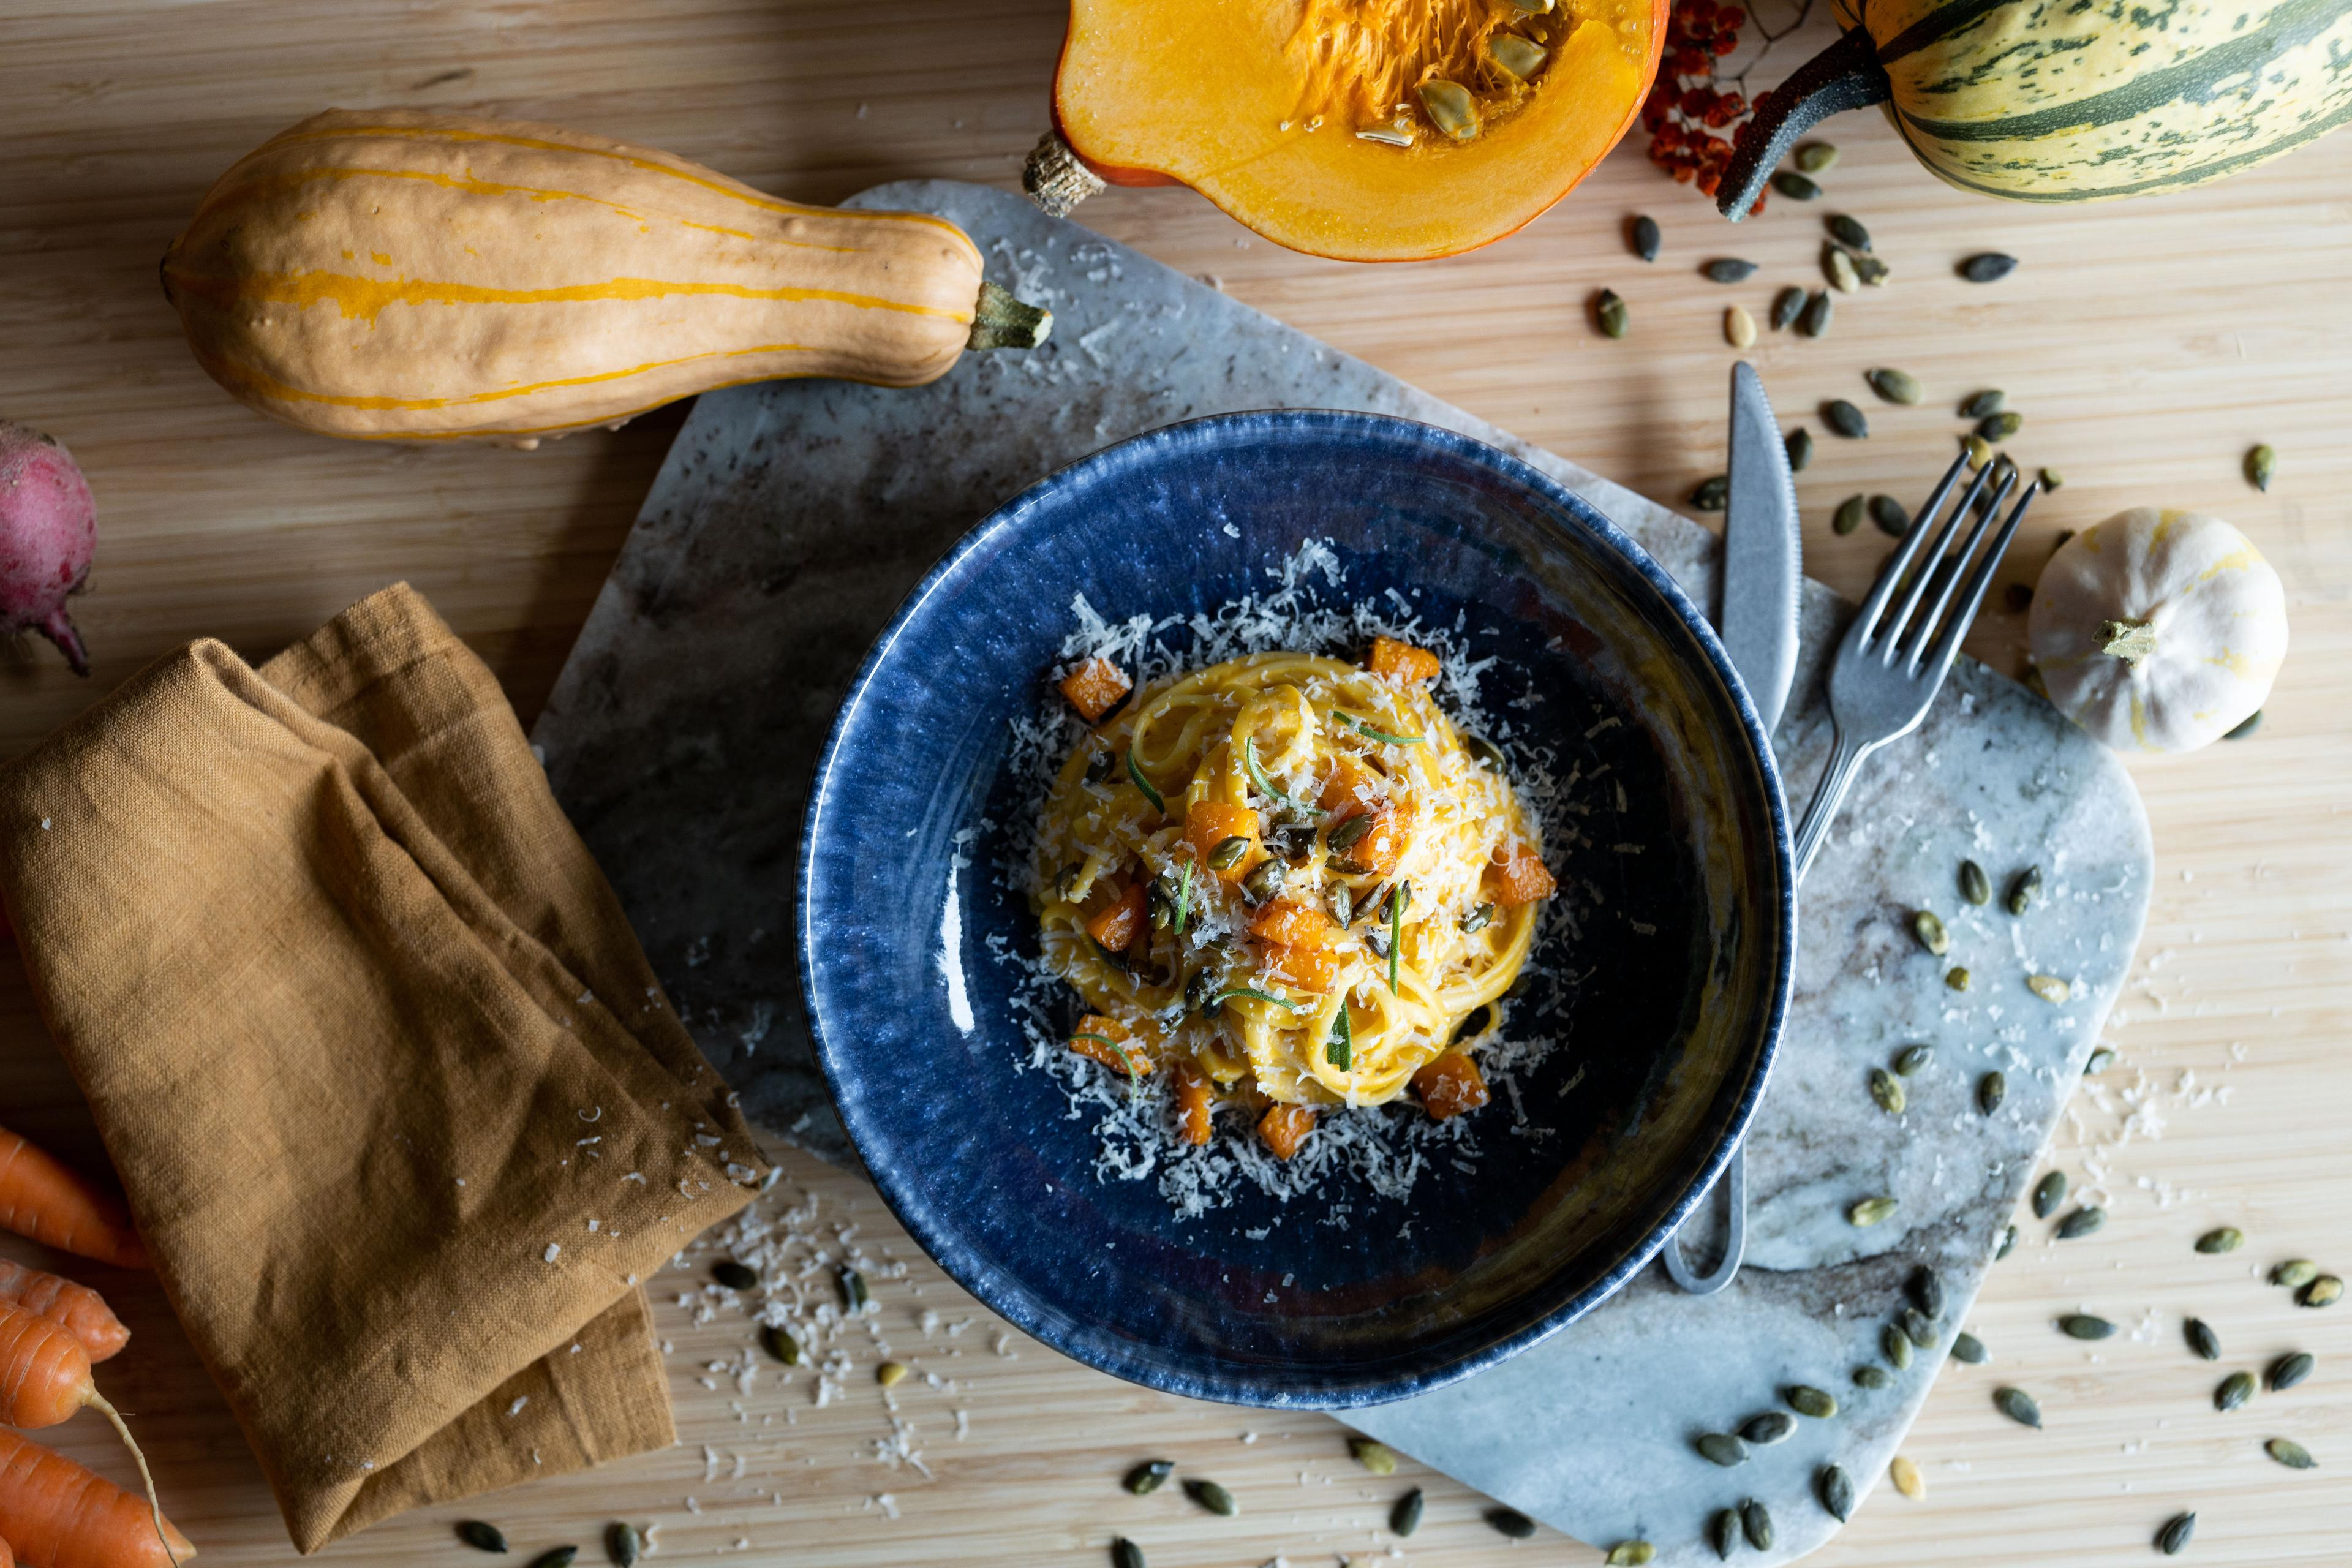 Linguini i kremet gresskarsaus  – smakfull Halloweenmat